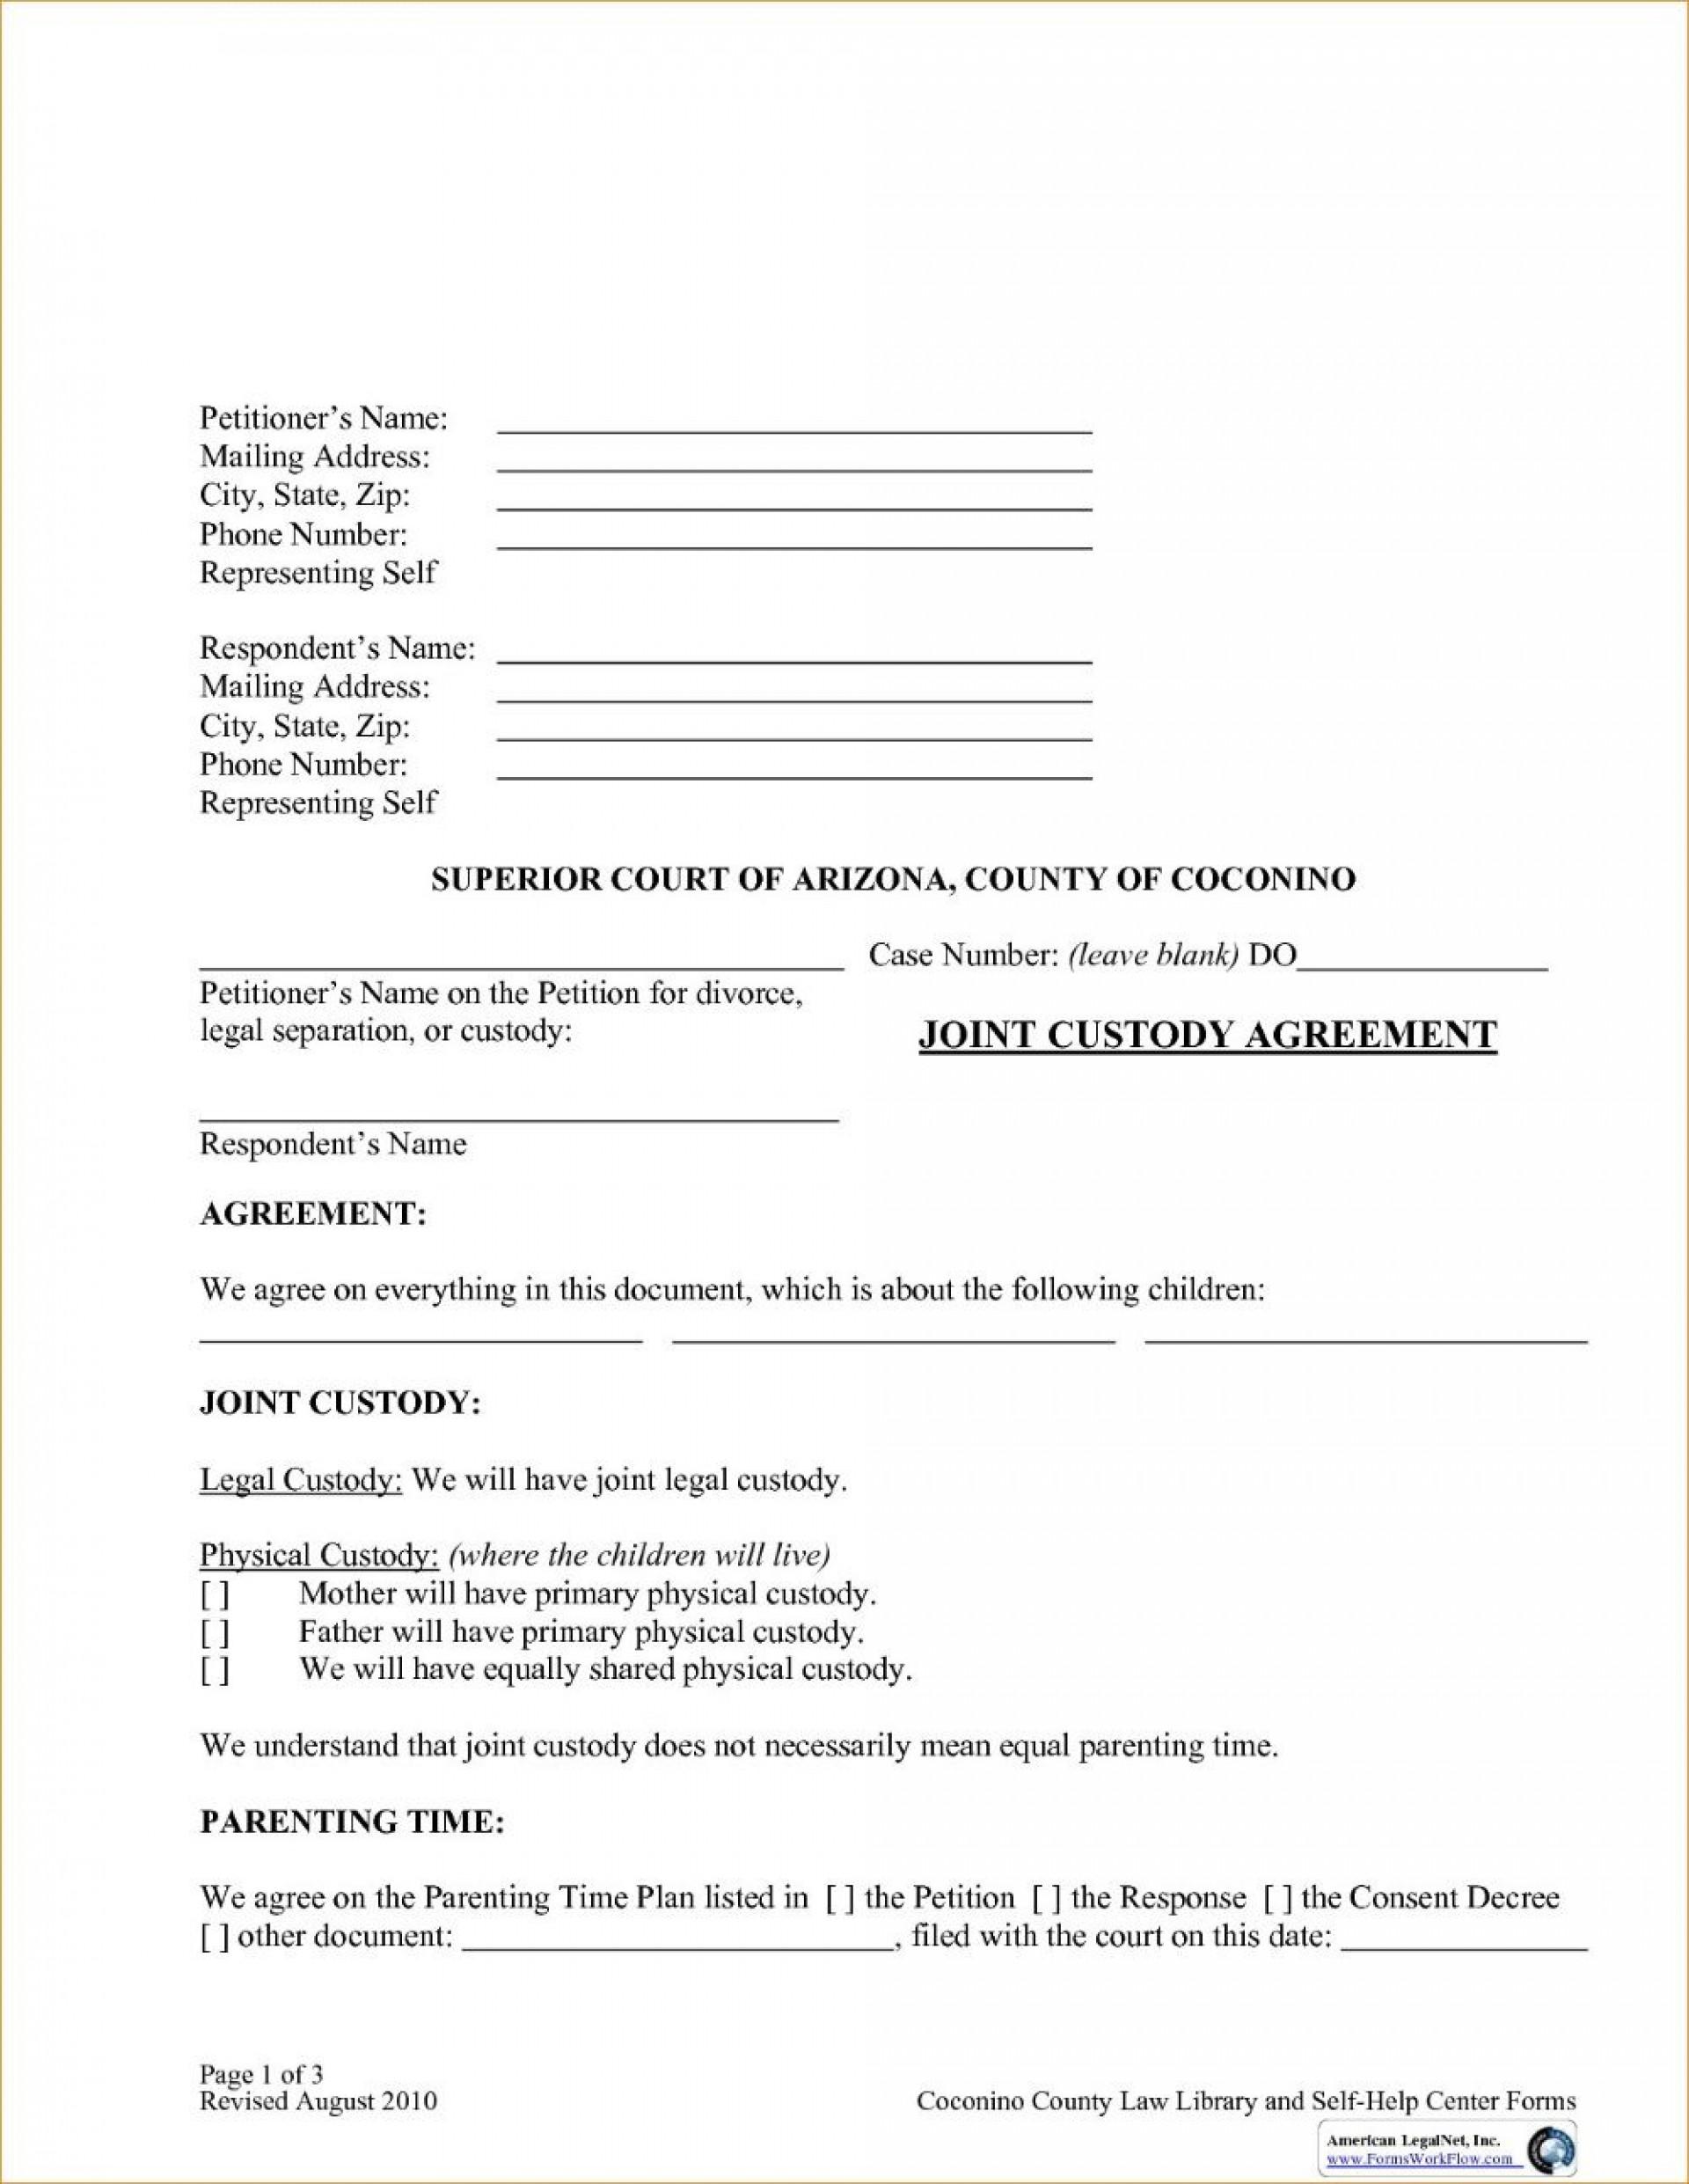 003 Impressive Child Custody Agreement Template High Def  Templates Pennsylvania Uk Free1920